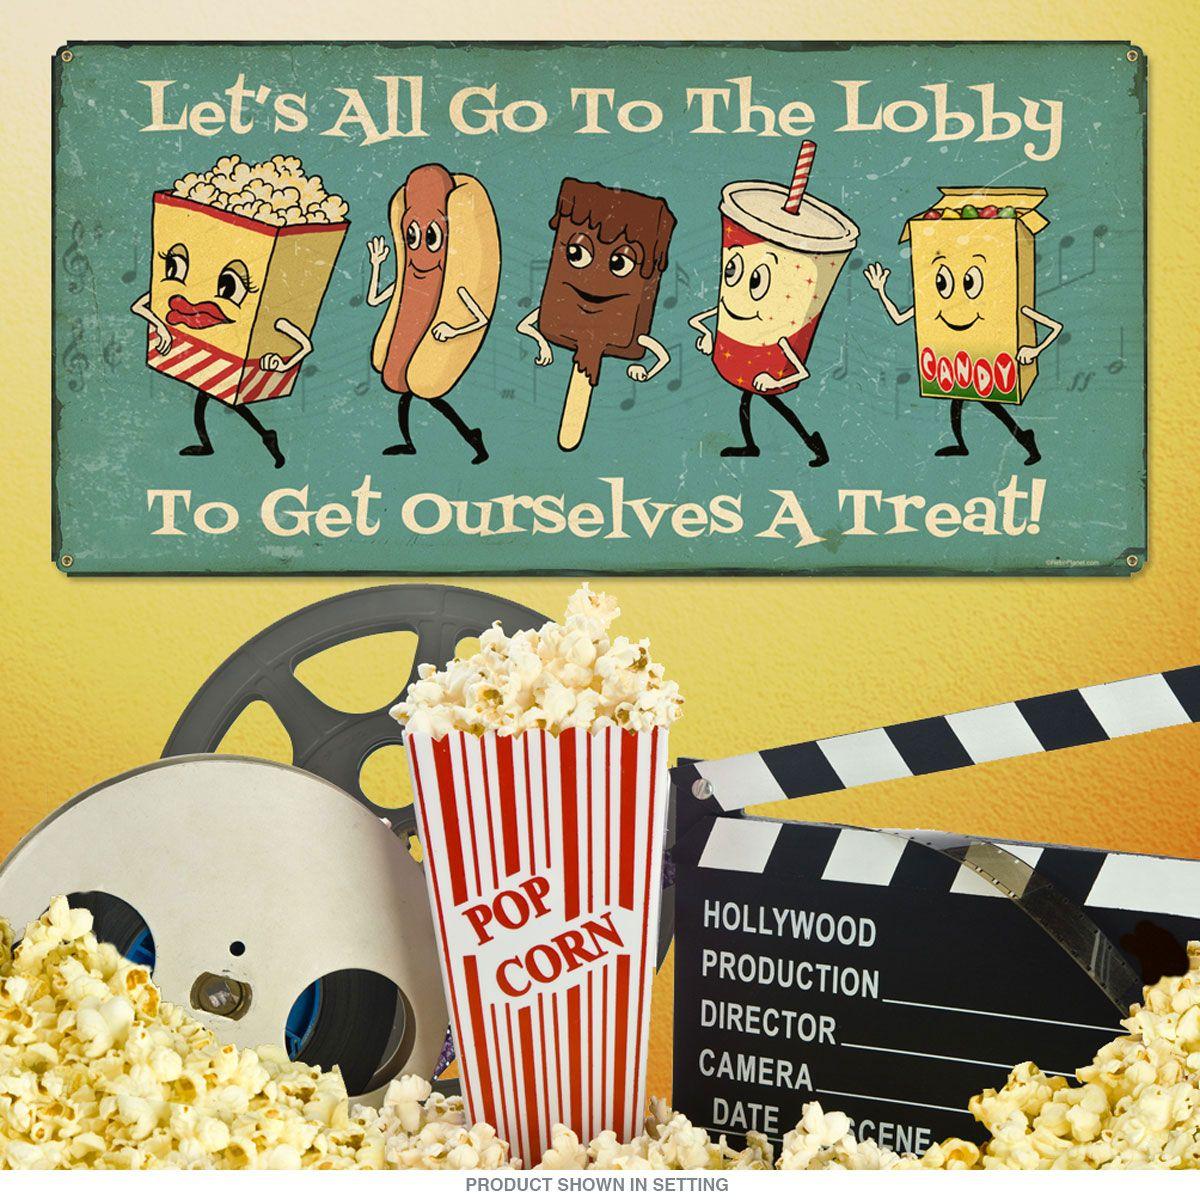 Lets Go Lobby Dancing Snacks Metal Sign 24 x 12 | Lobbies, Steel and ...